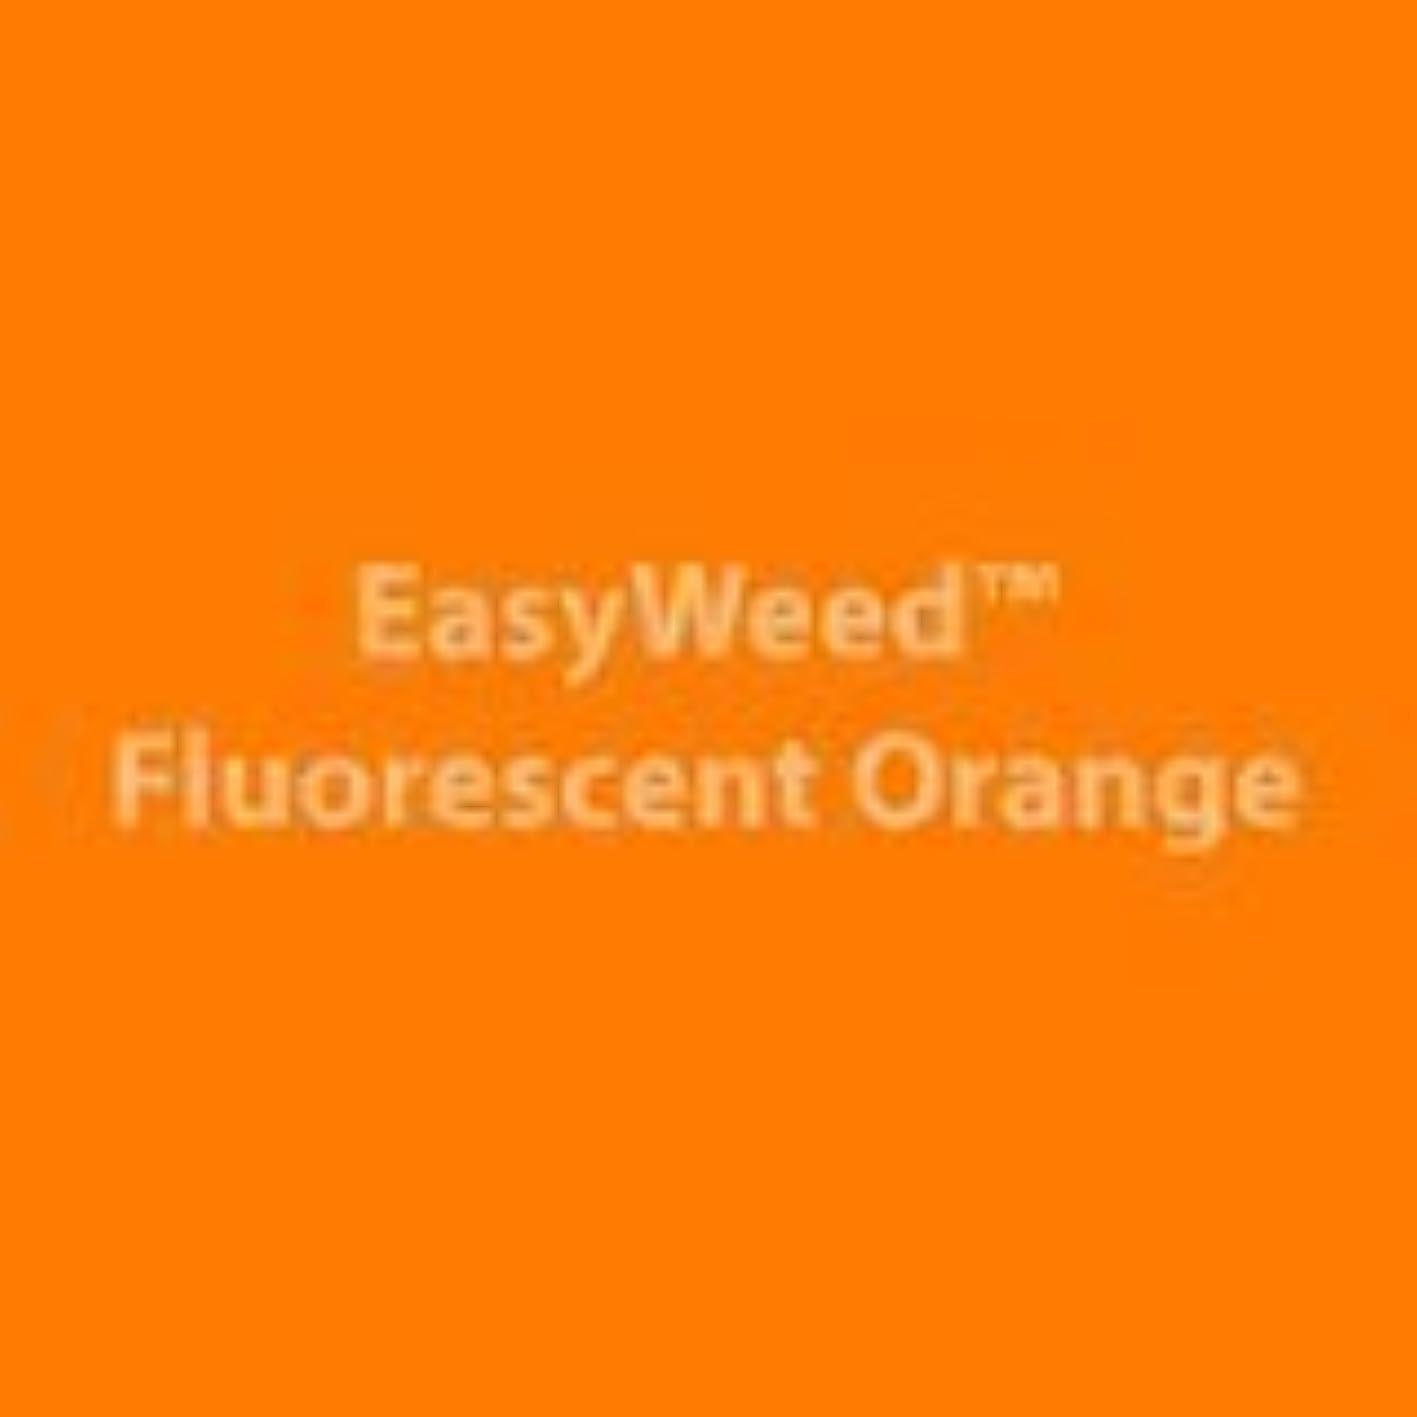 Siser Easyweed Fluorescent Orange Heat Transfer Vinyl 12x15 Sheet - Southern Signage - Craft Vinyl - HTV - Siser Easyweed trhiksedesl822